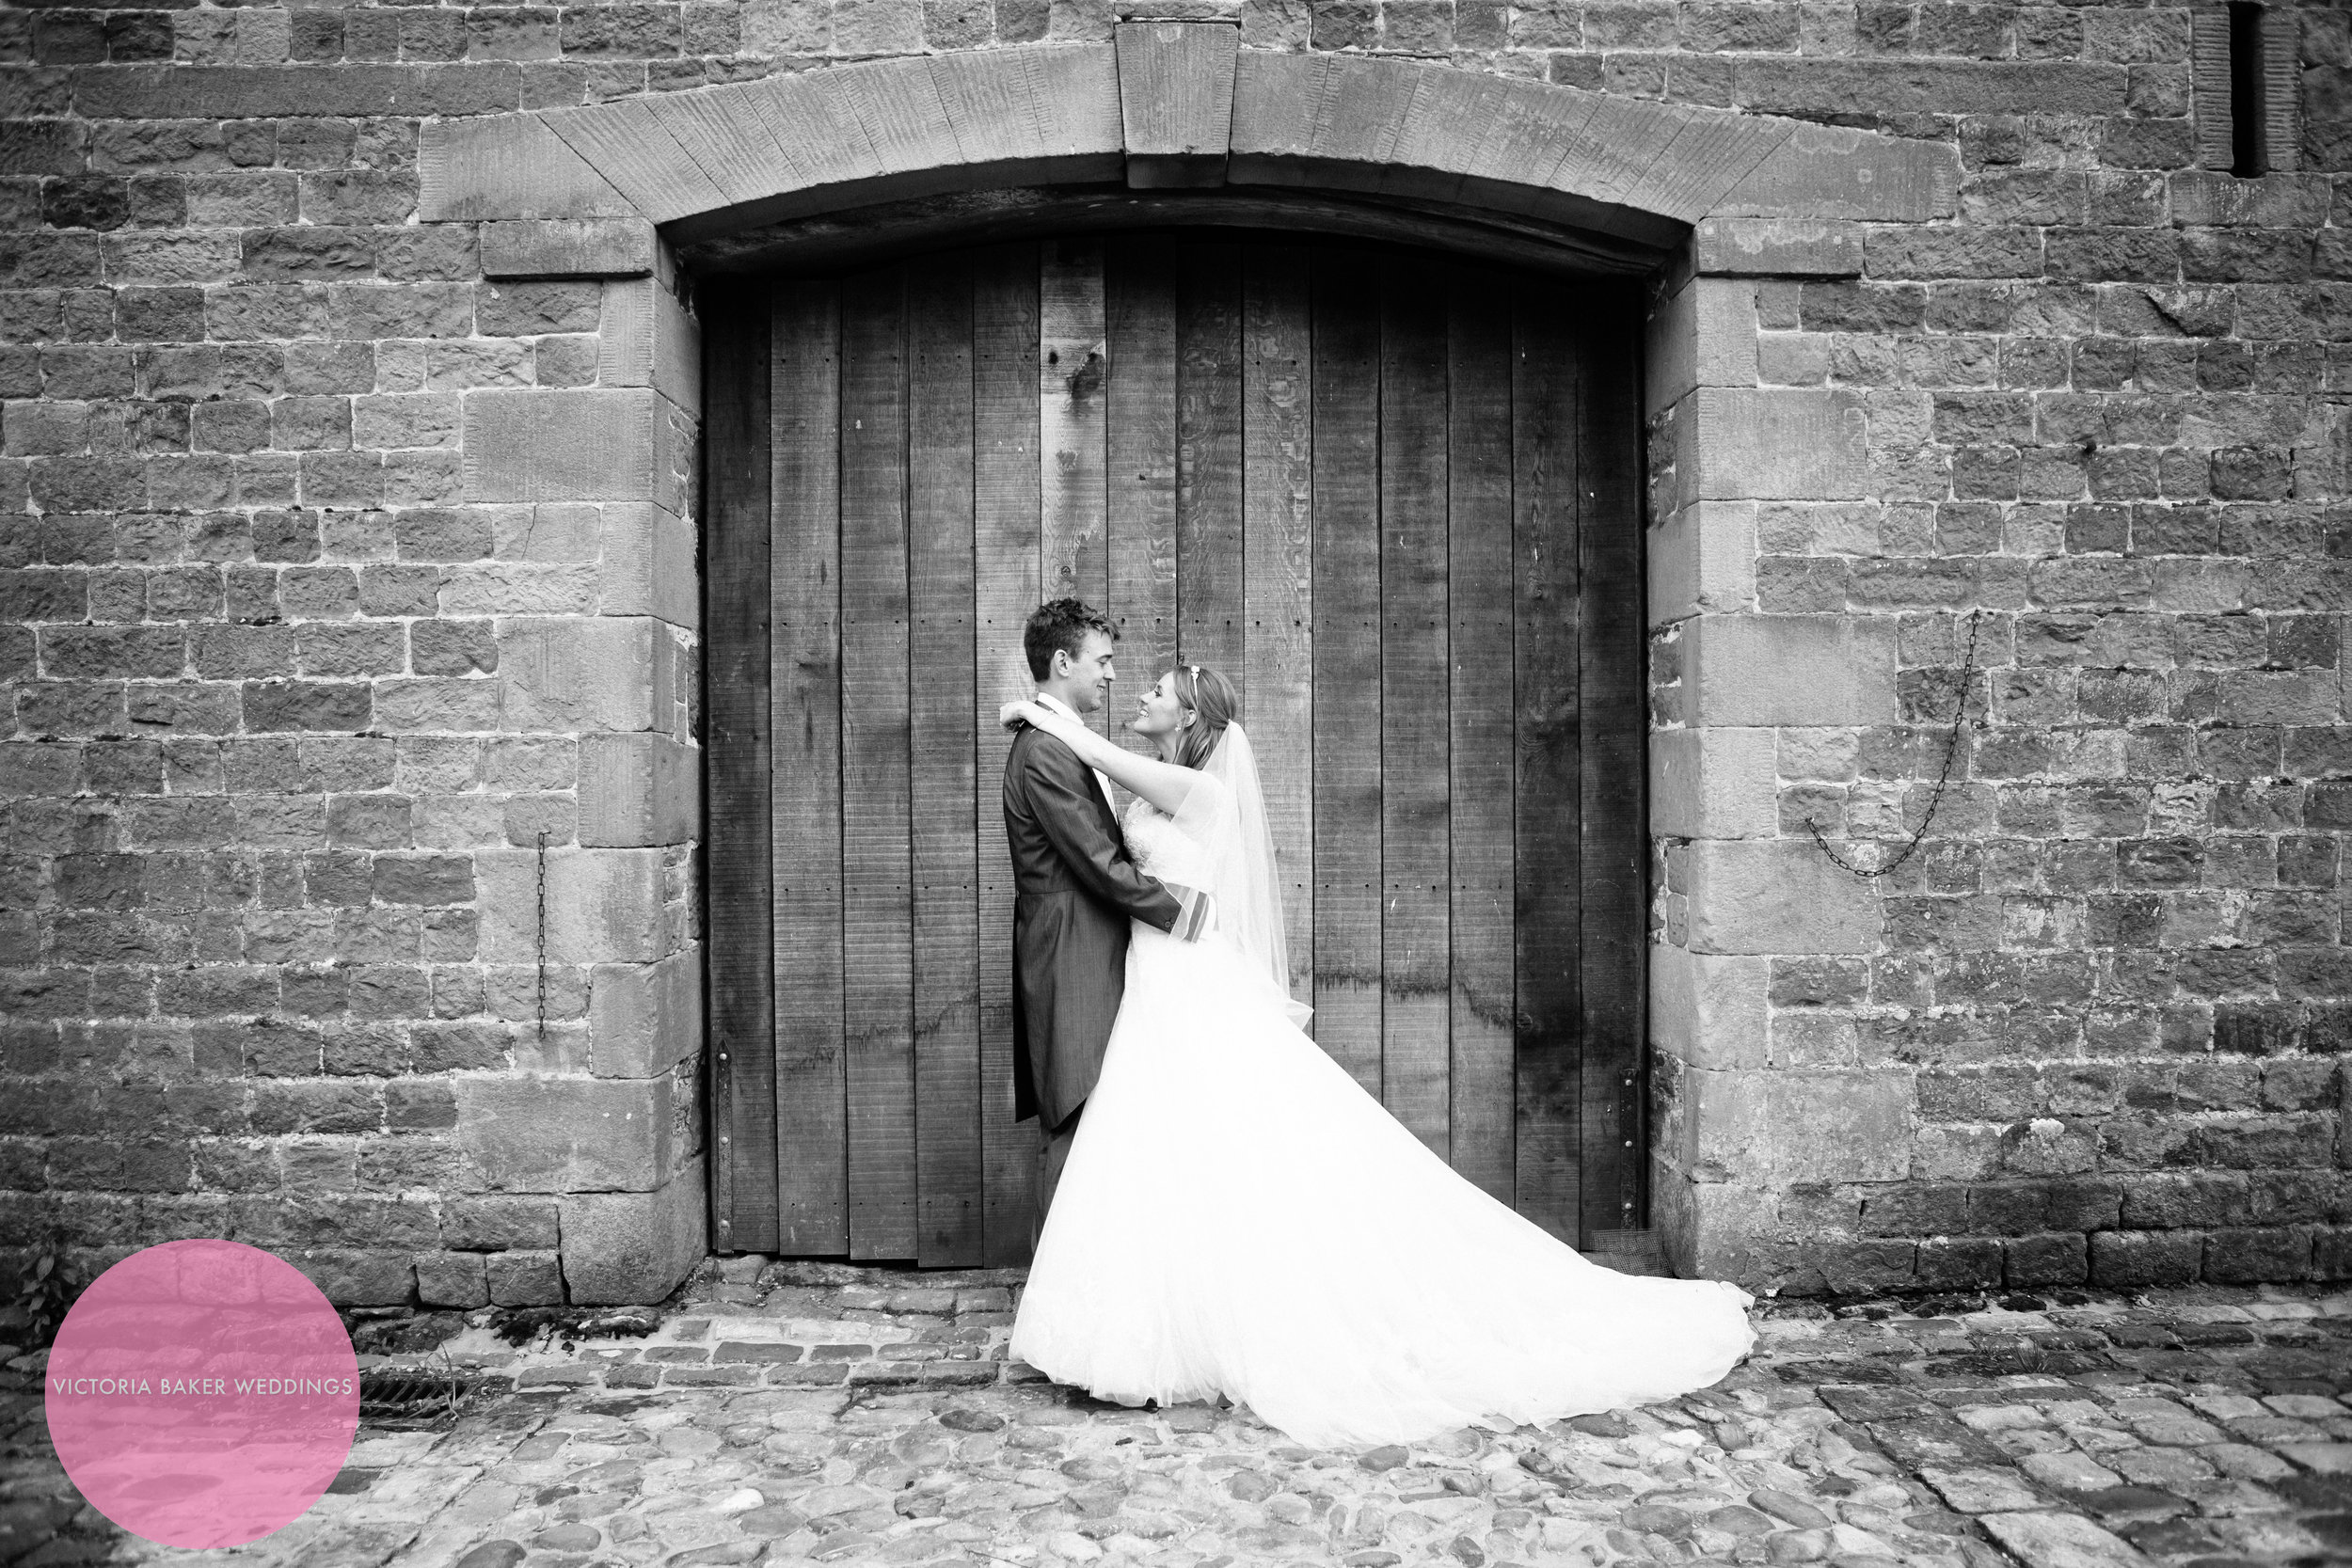 Best wedding photographs 2016 - bride and groom